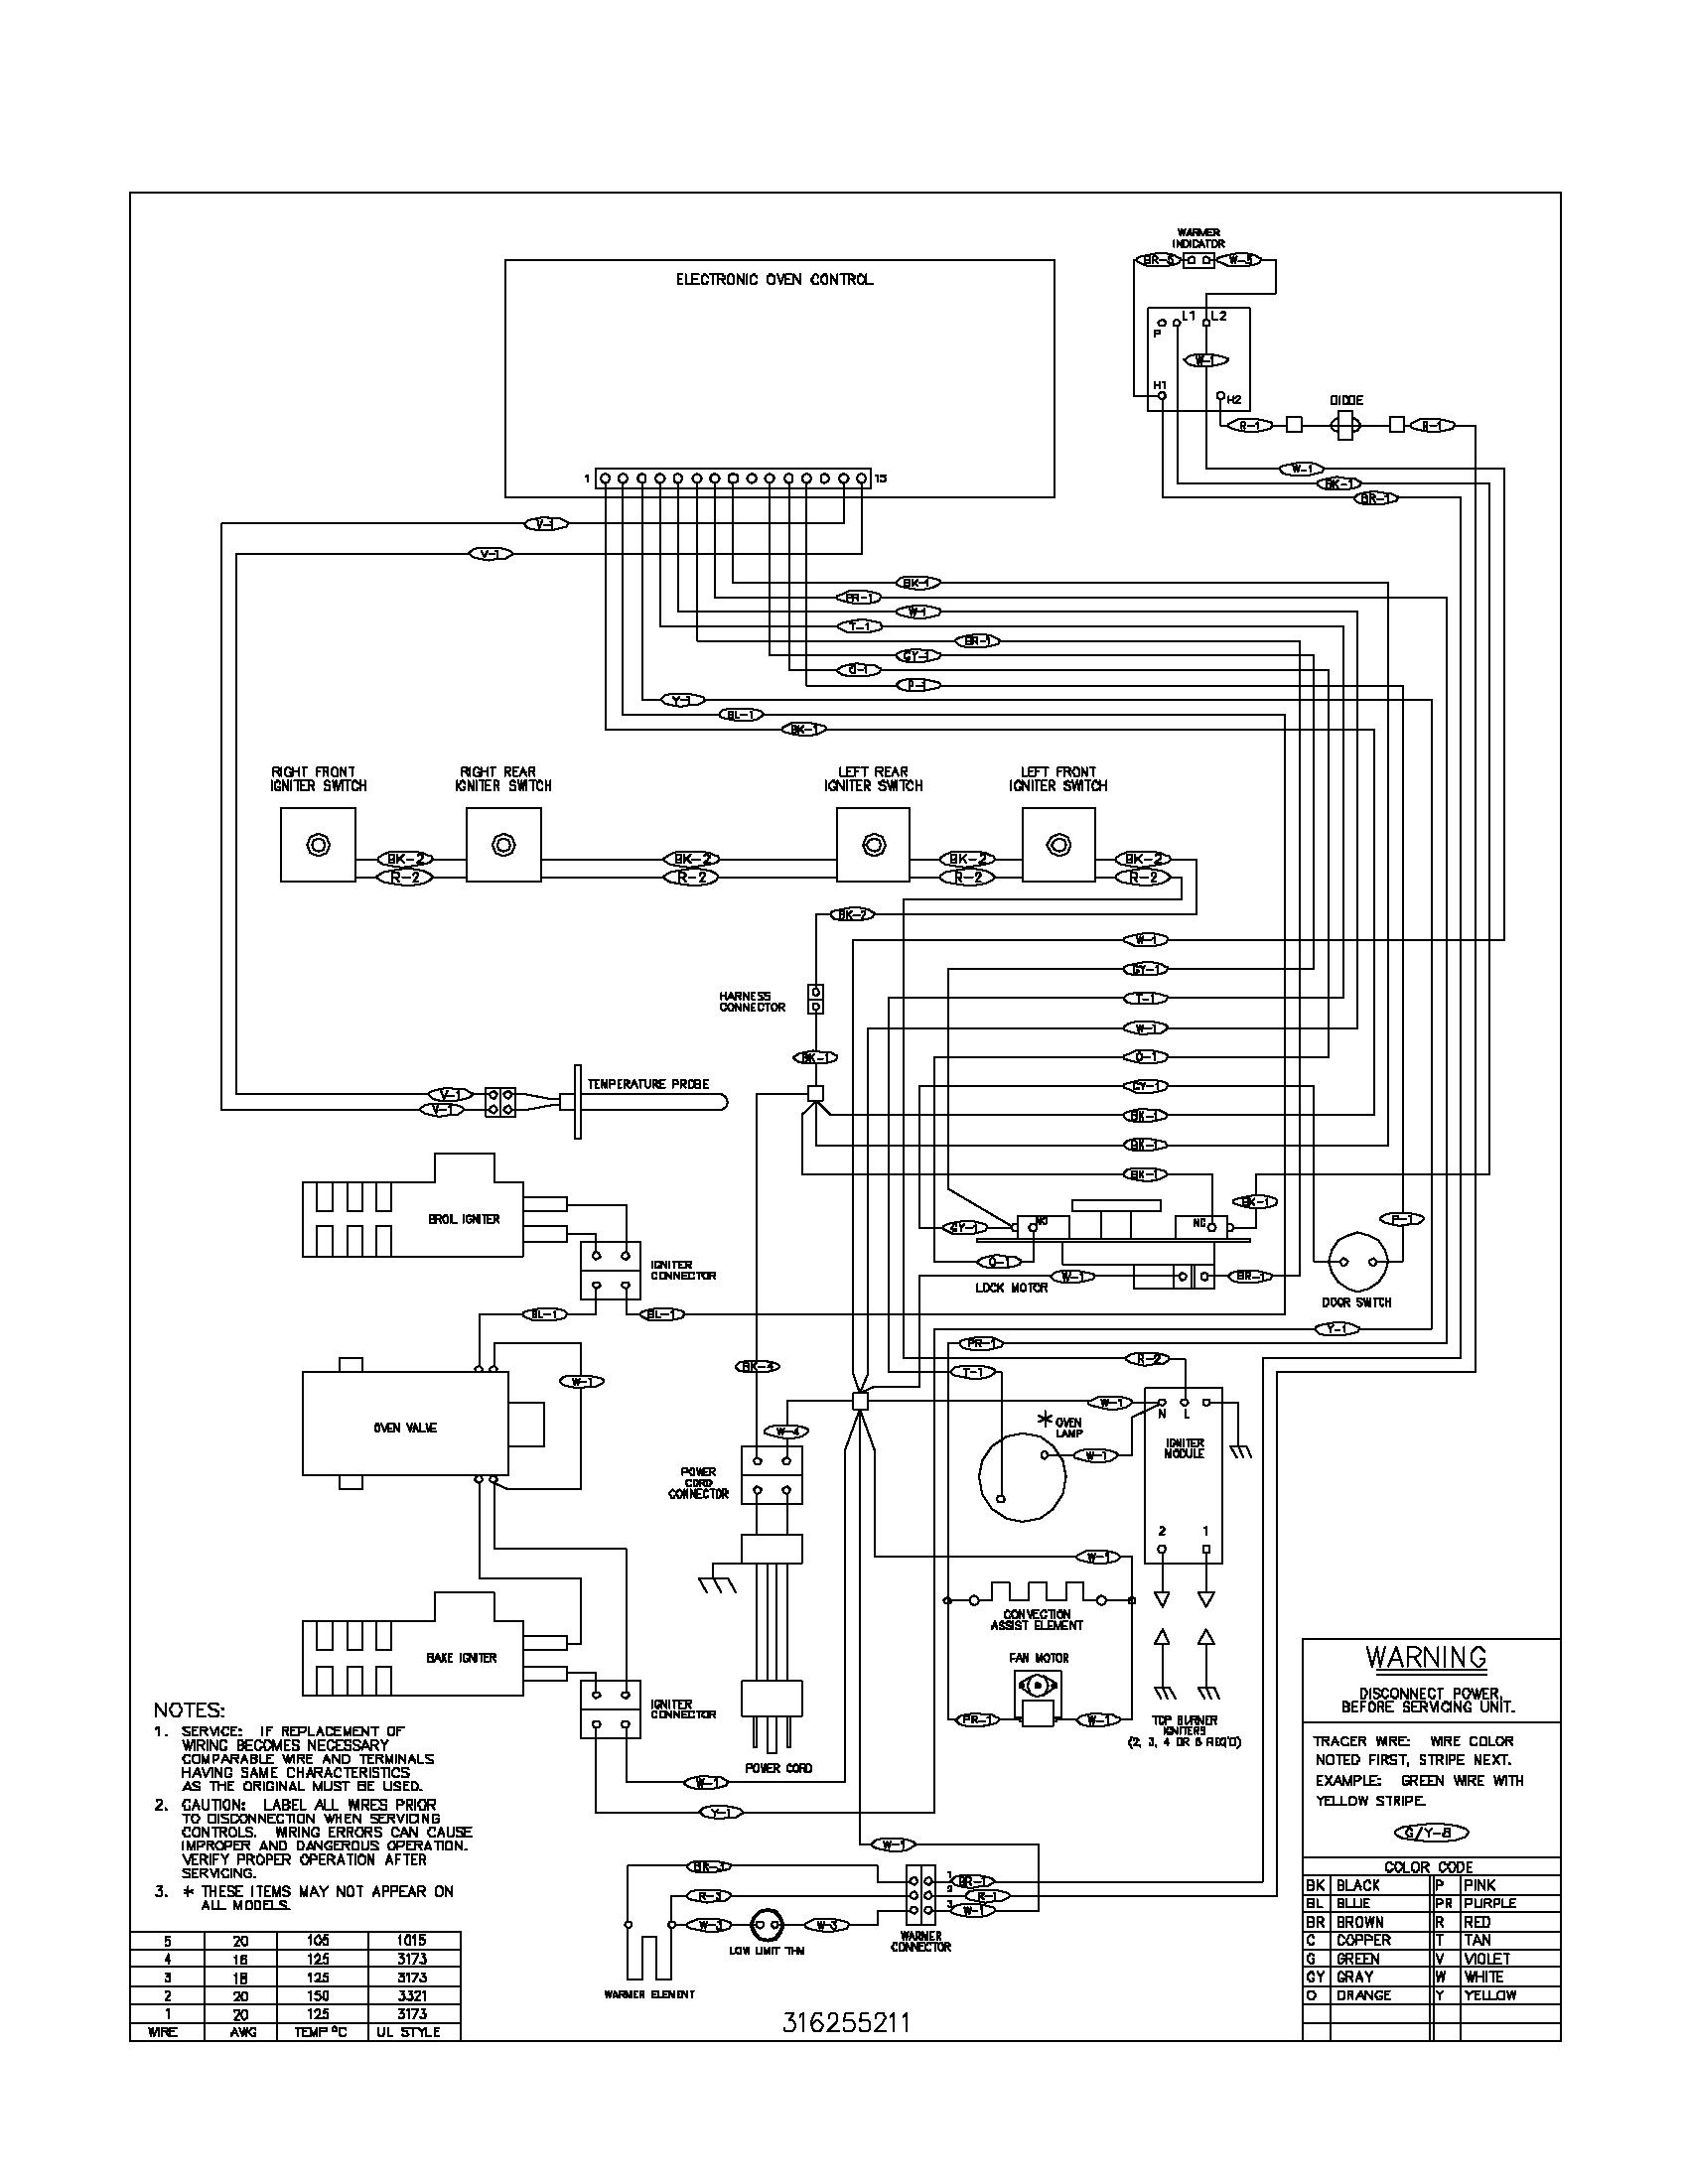 modern nissan patrol wiring diagram crest best images for wiring rh oursweetbakeshop info 2001 BMW 325I Wiring Diagram Audi ECU Schematic